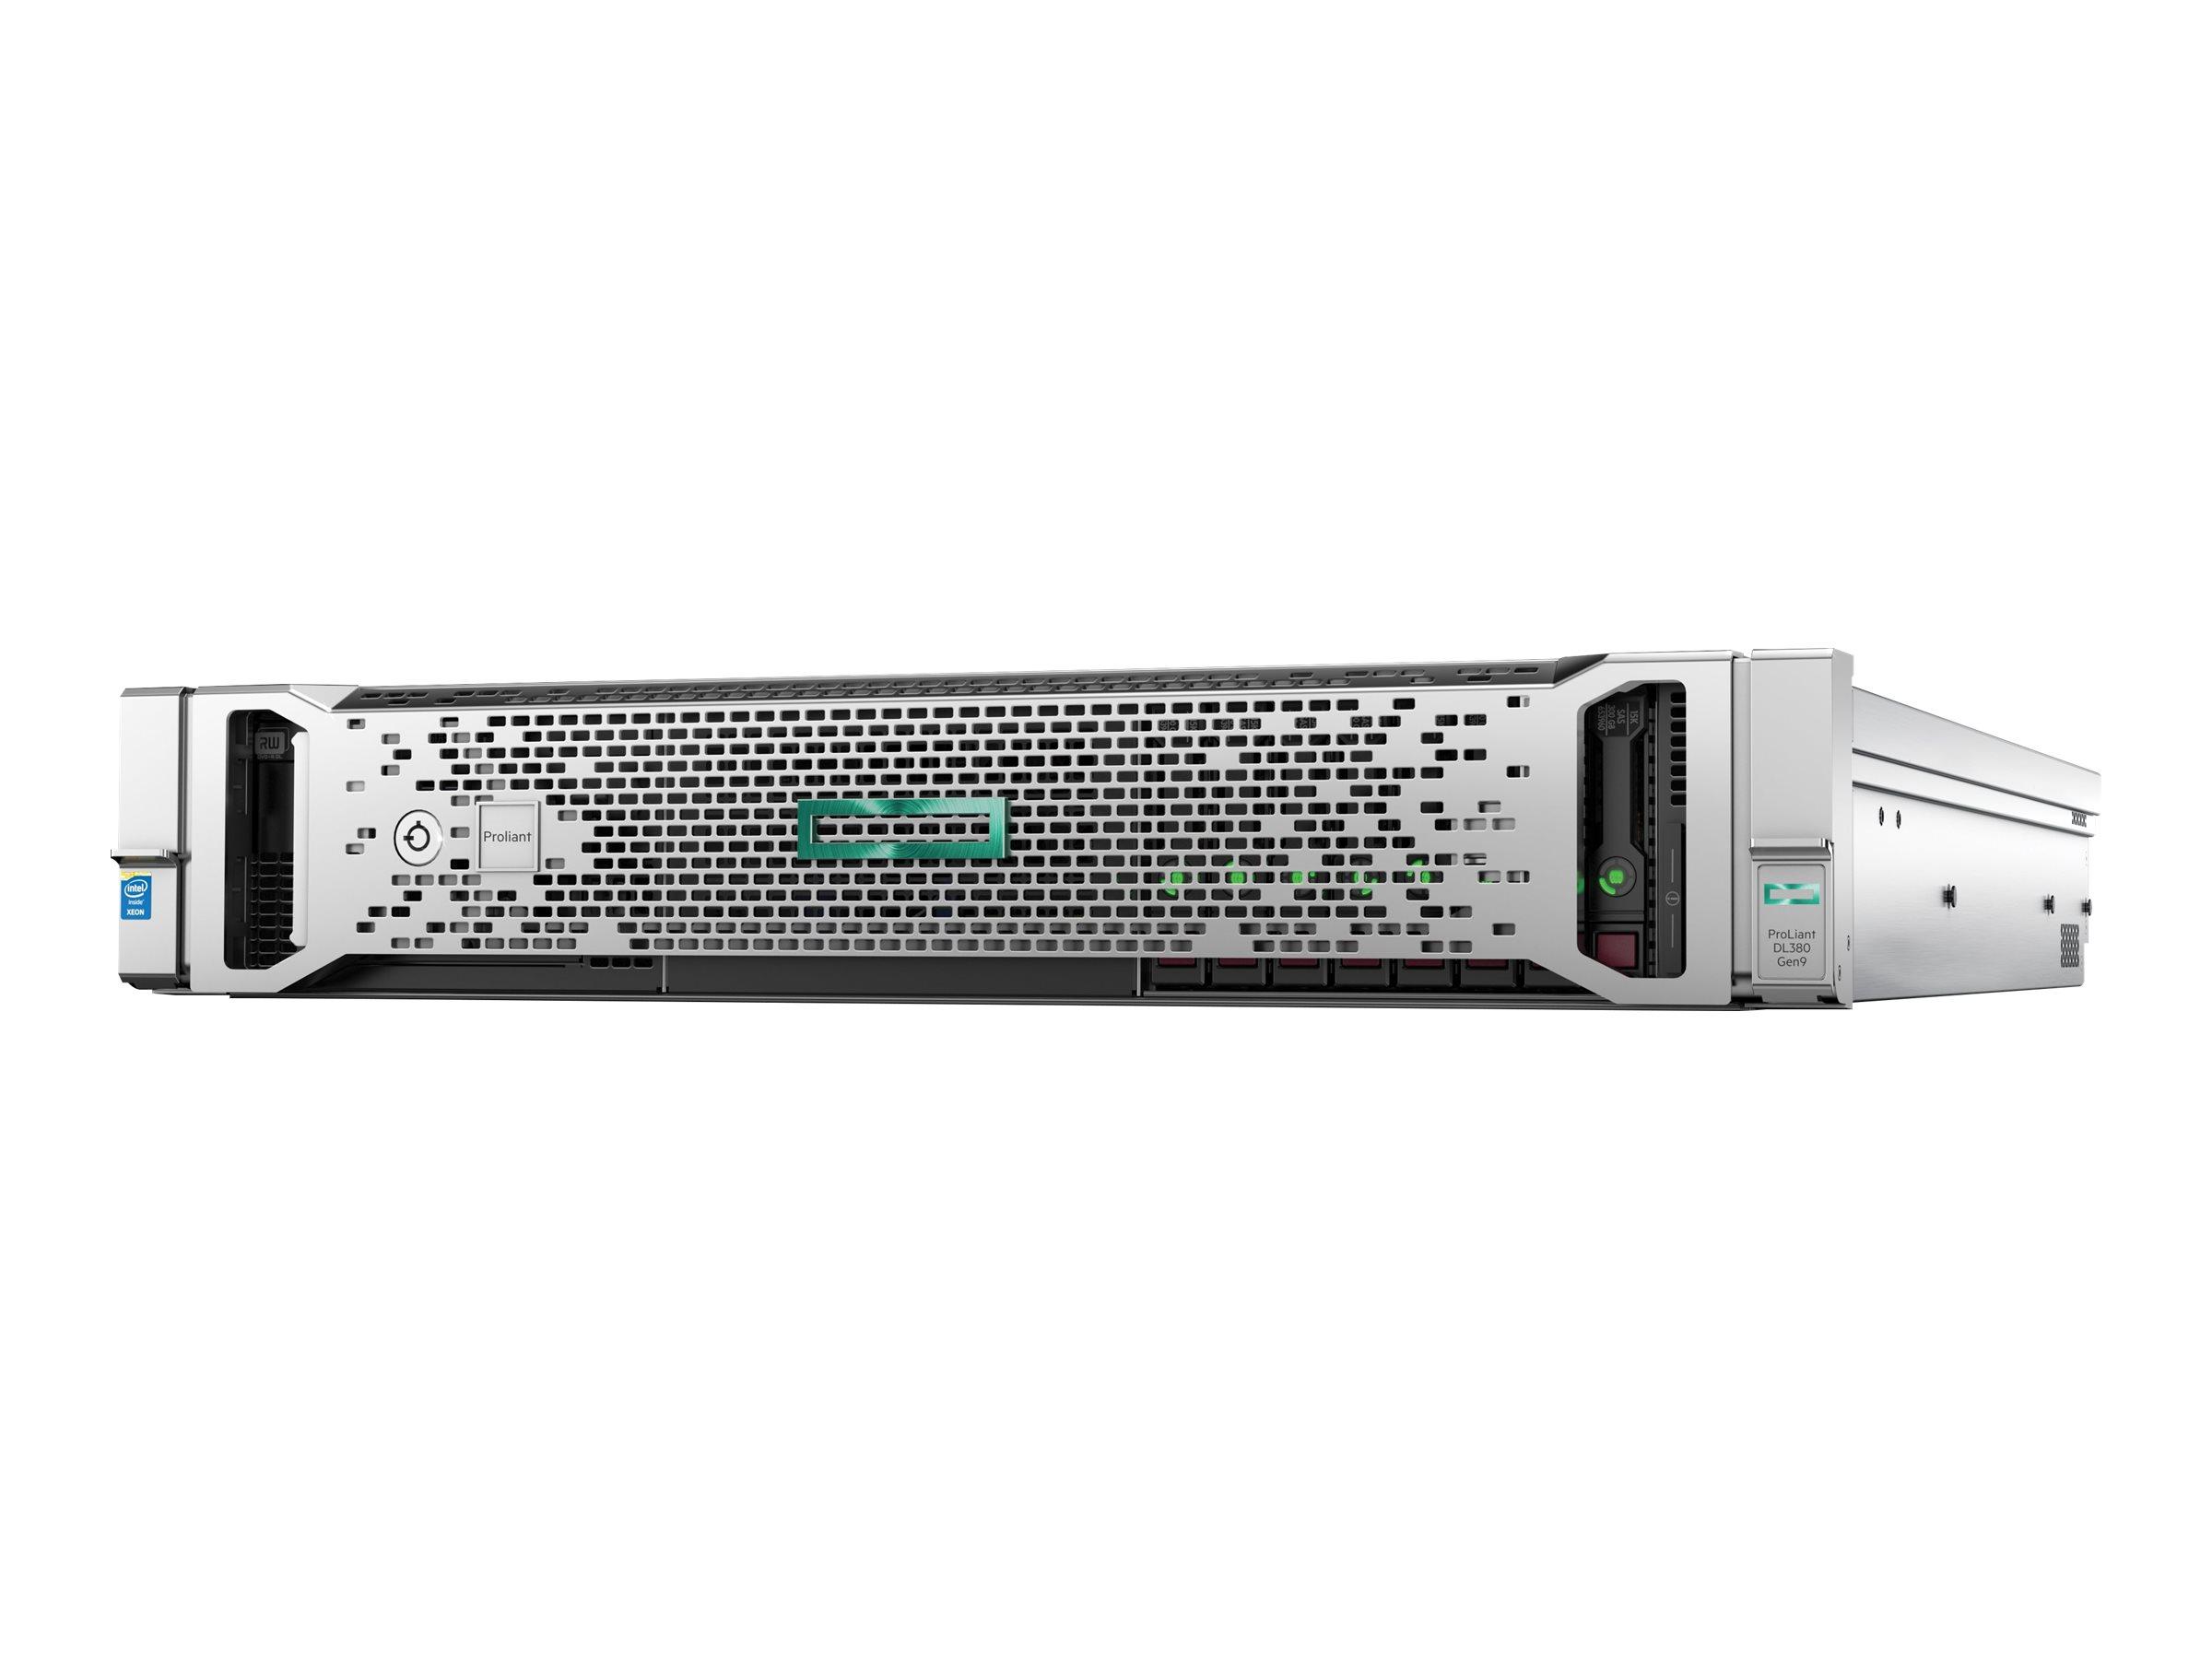 HPE DL380 Gen9 E5-2620v4 1P 16G 8SFF Svr (843556-425)